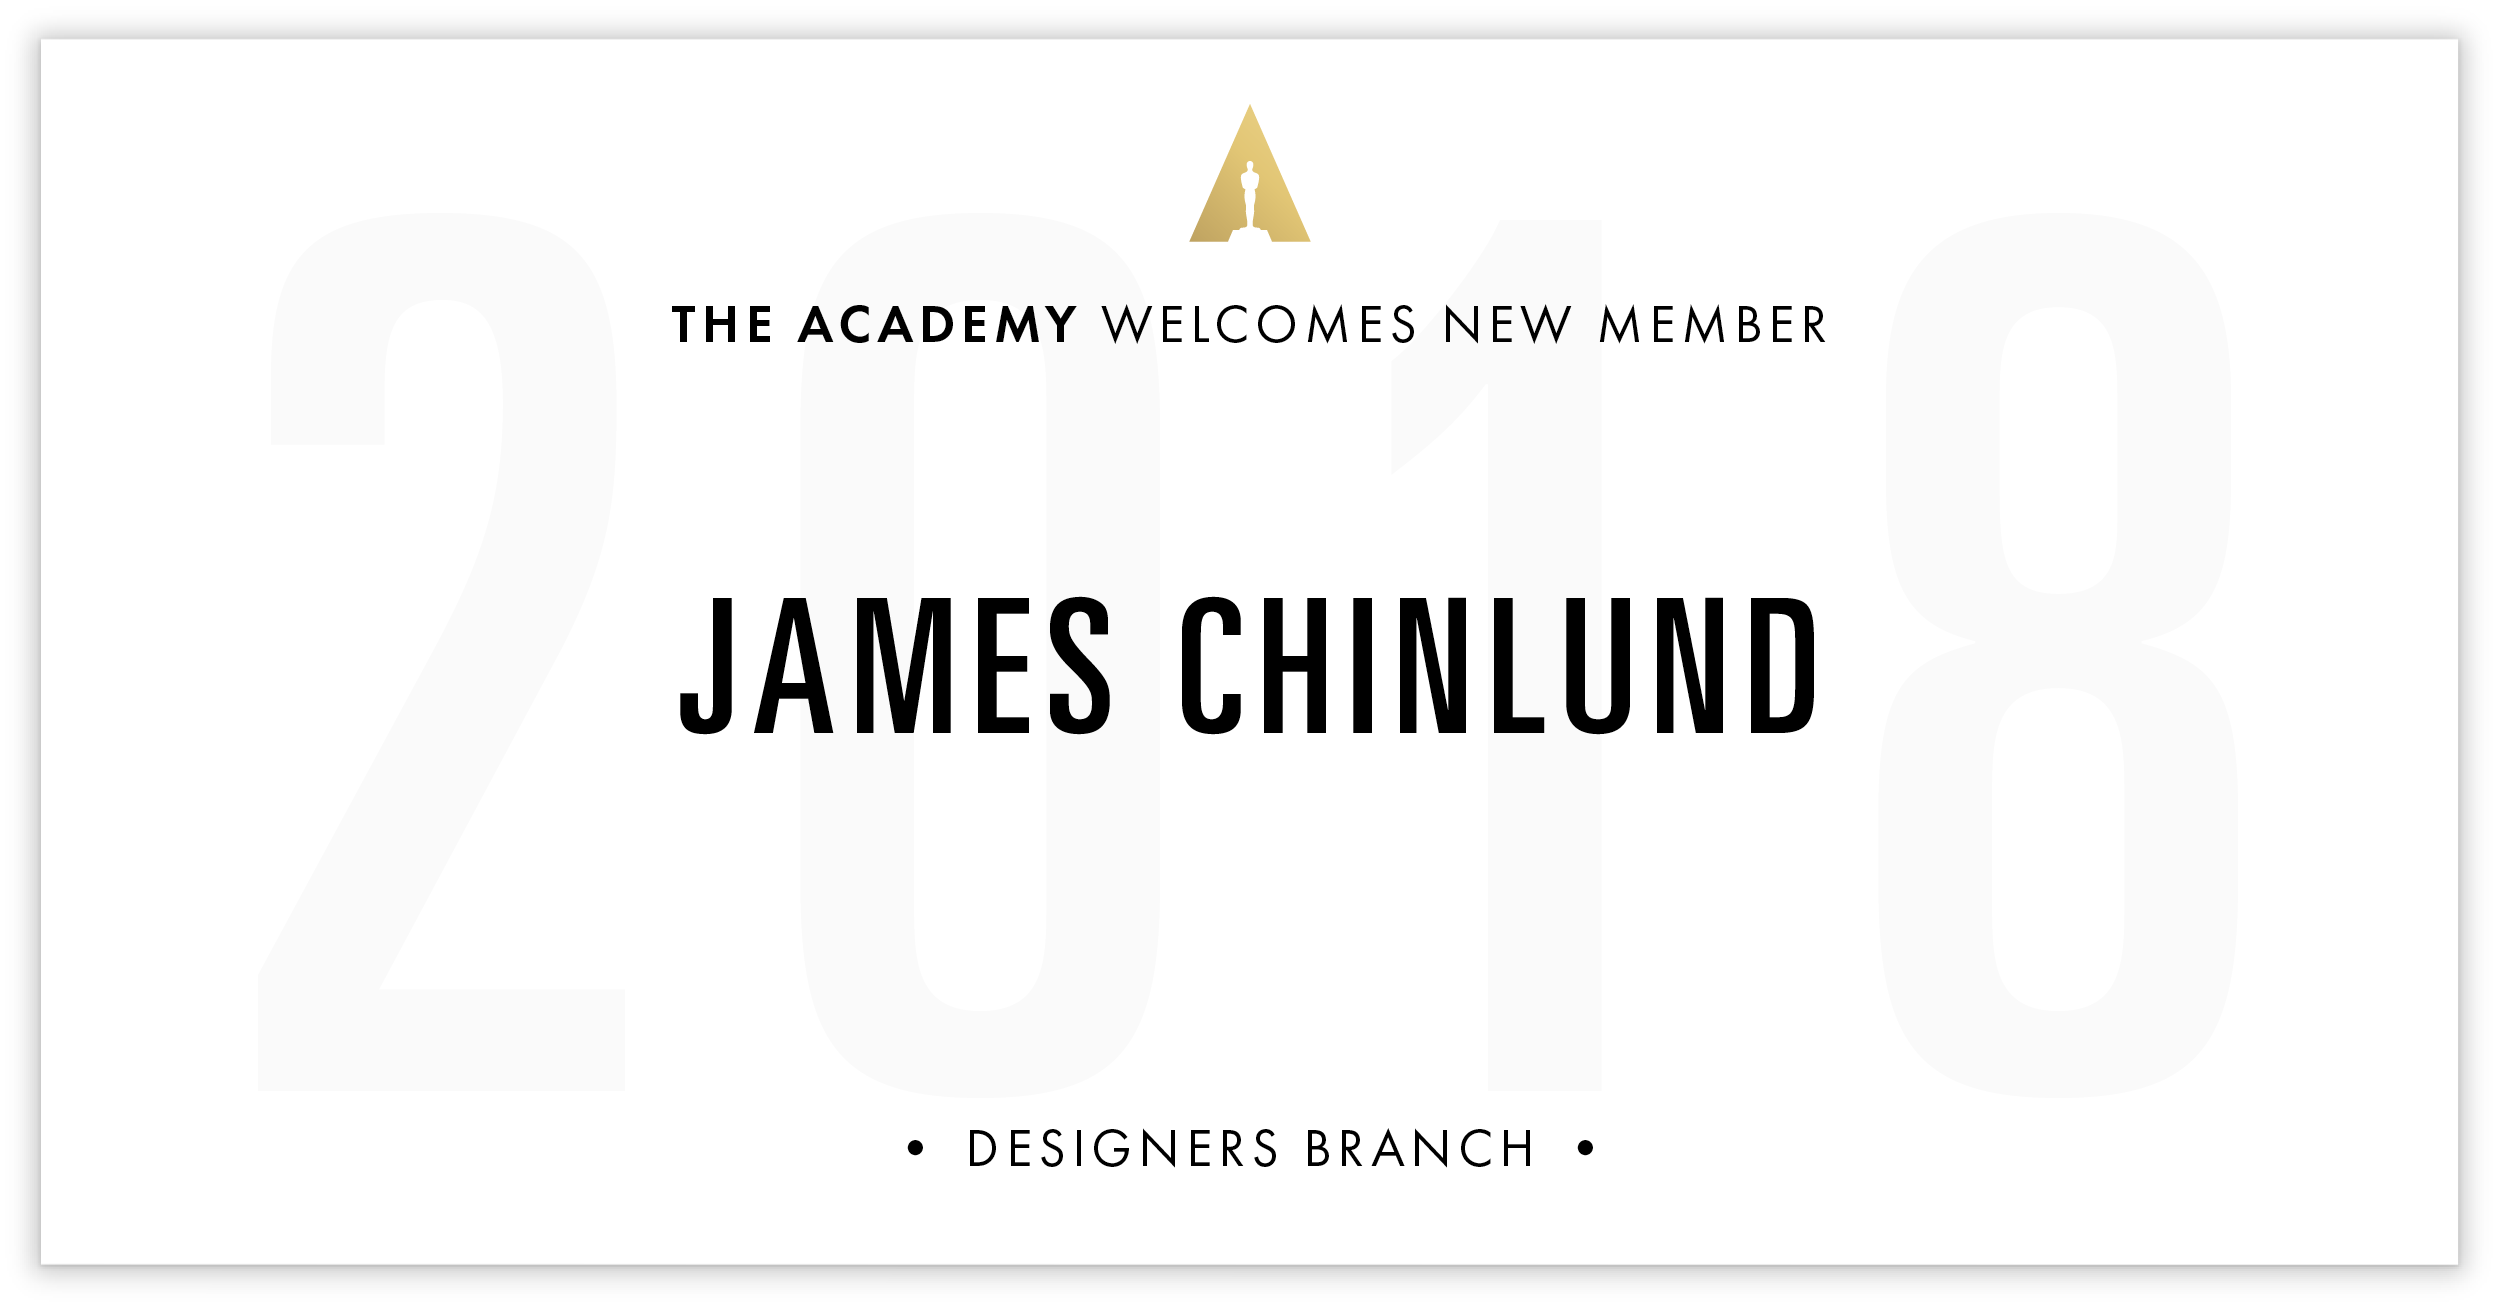 James Chinlund is invited!